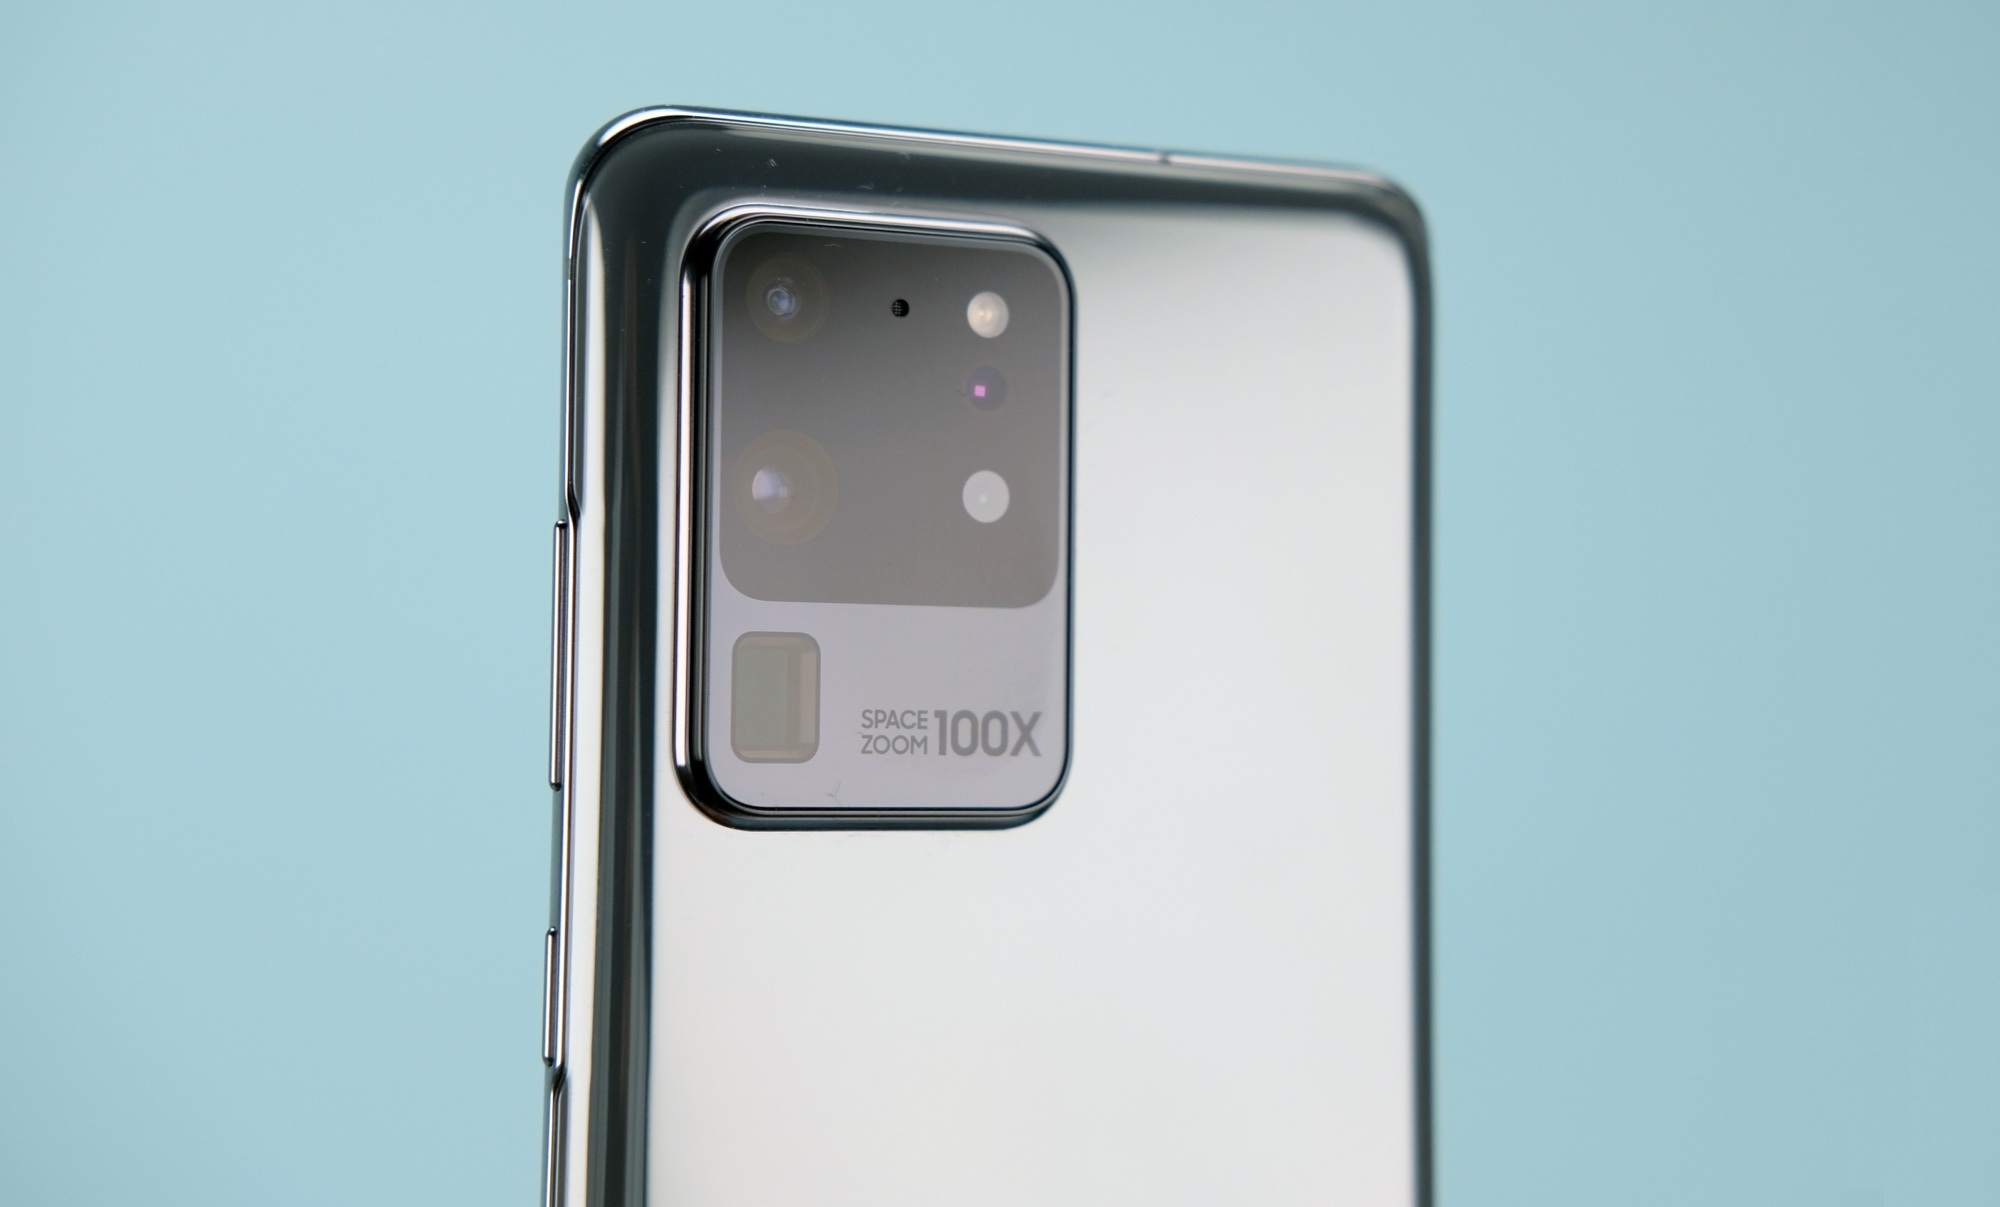 Samsung Galaxy S20 Ultra - функции камеры: 100x zoom и 108MP 1 - lenium.ru